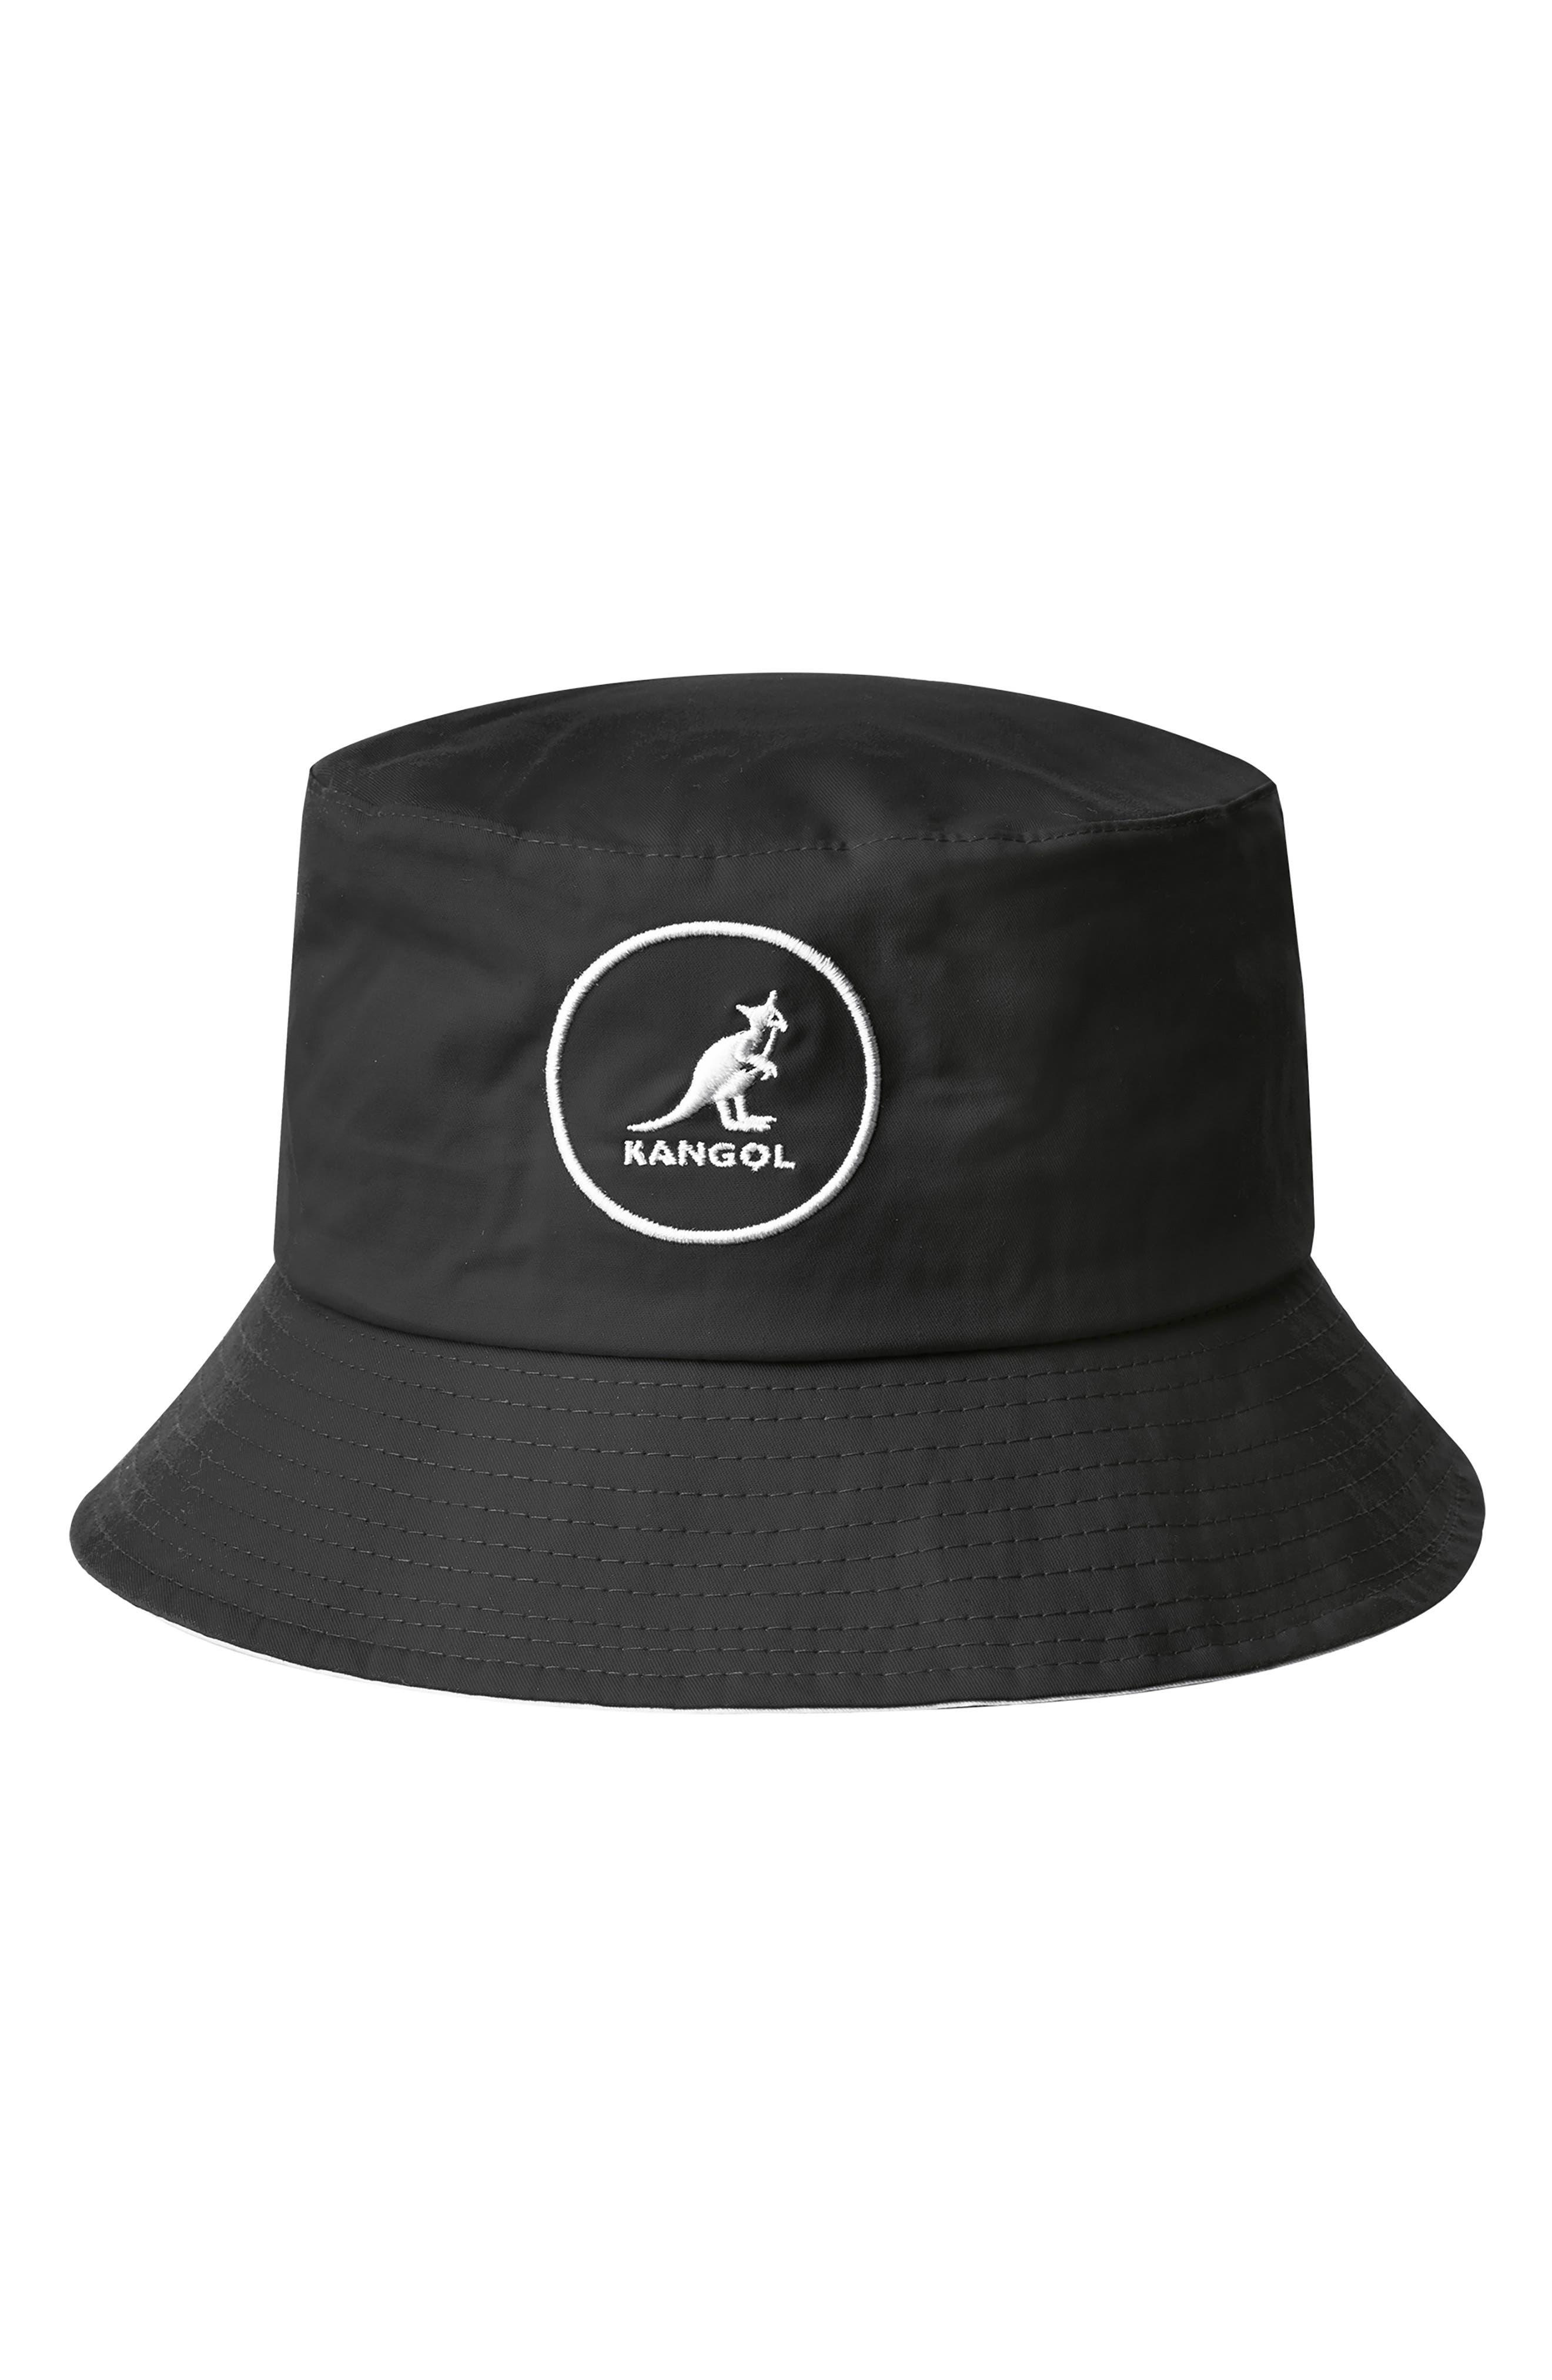 KANGOL Cotton Bucket Hat - Black